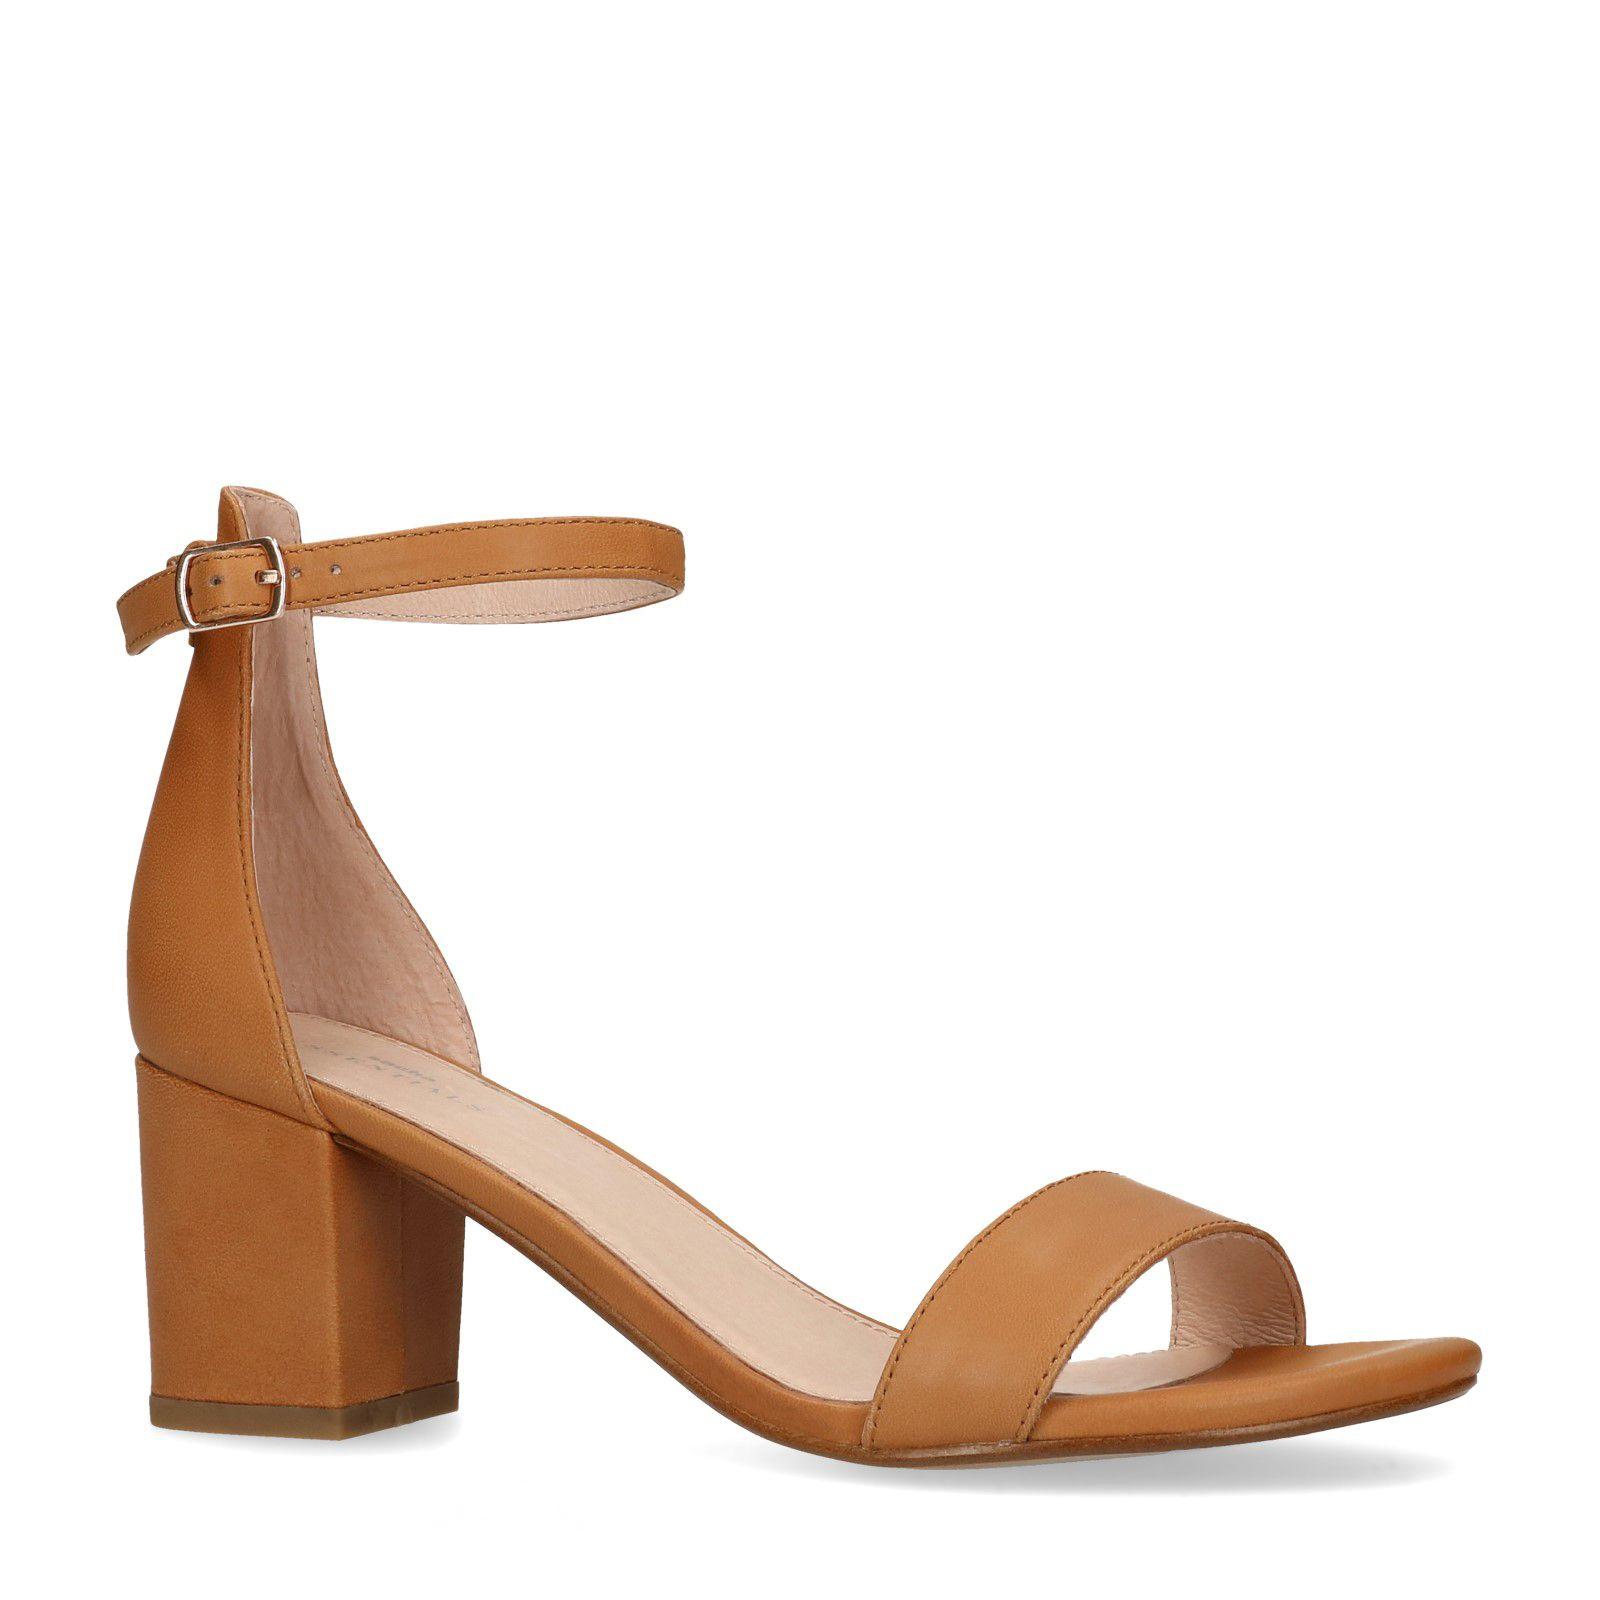 Bruine leren slippers met lage hak Dames | MANFIELD